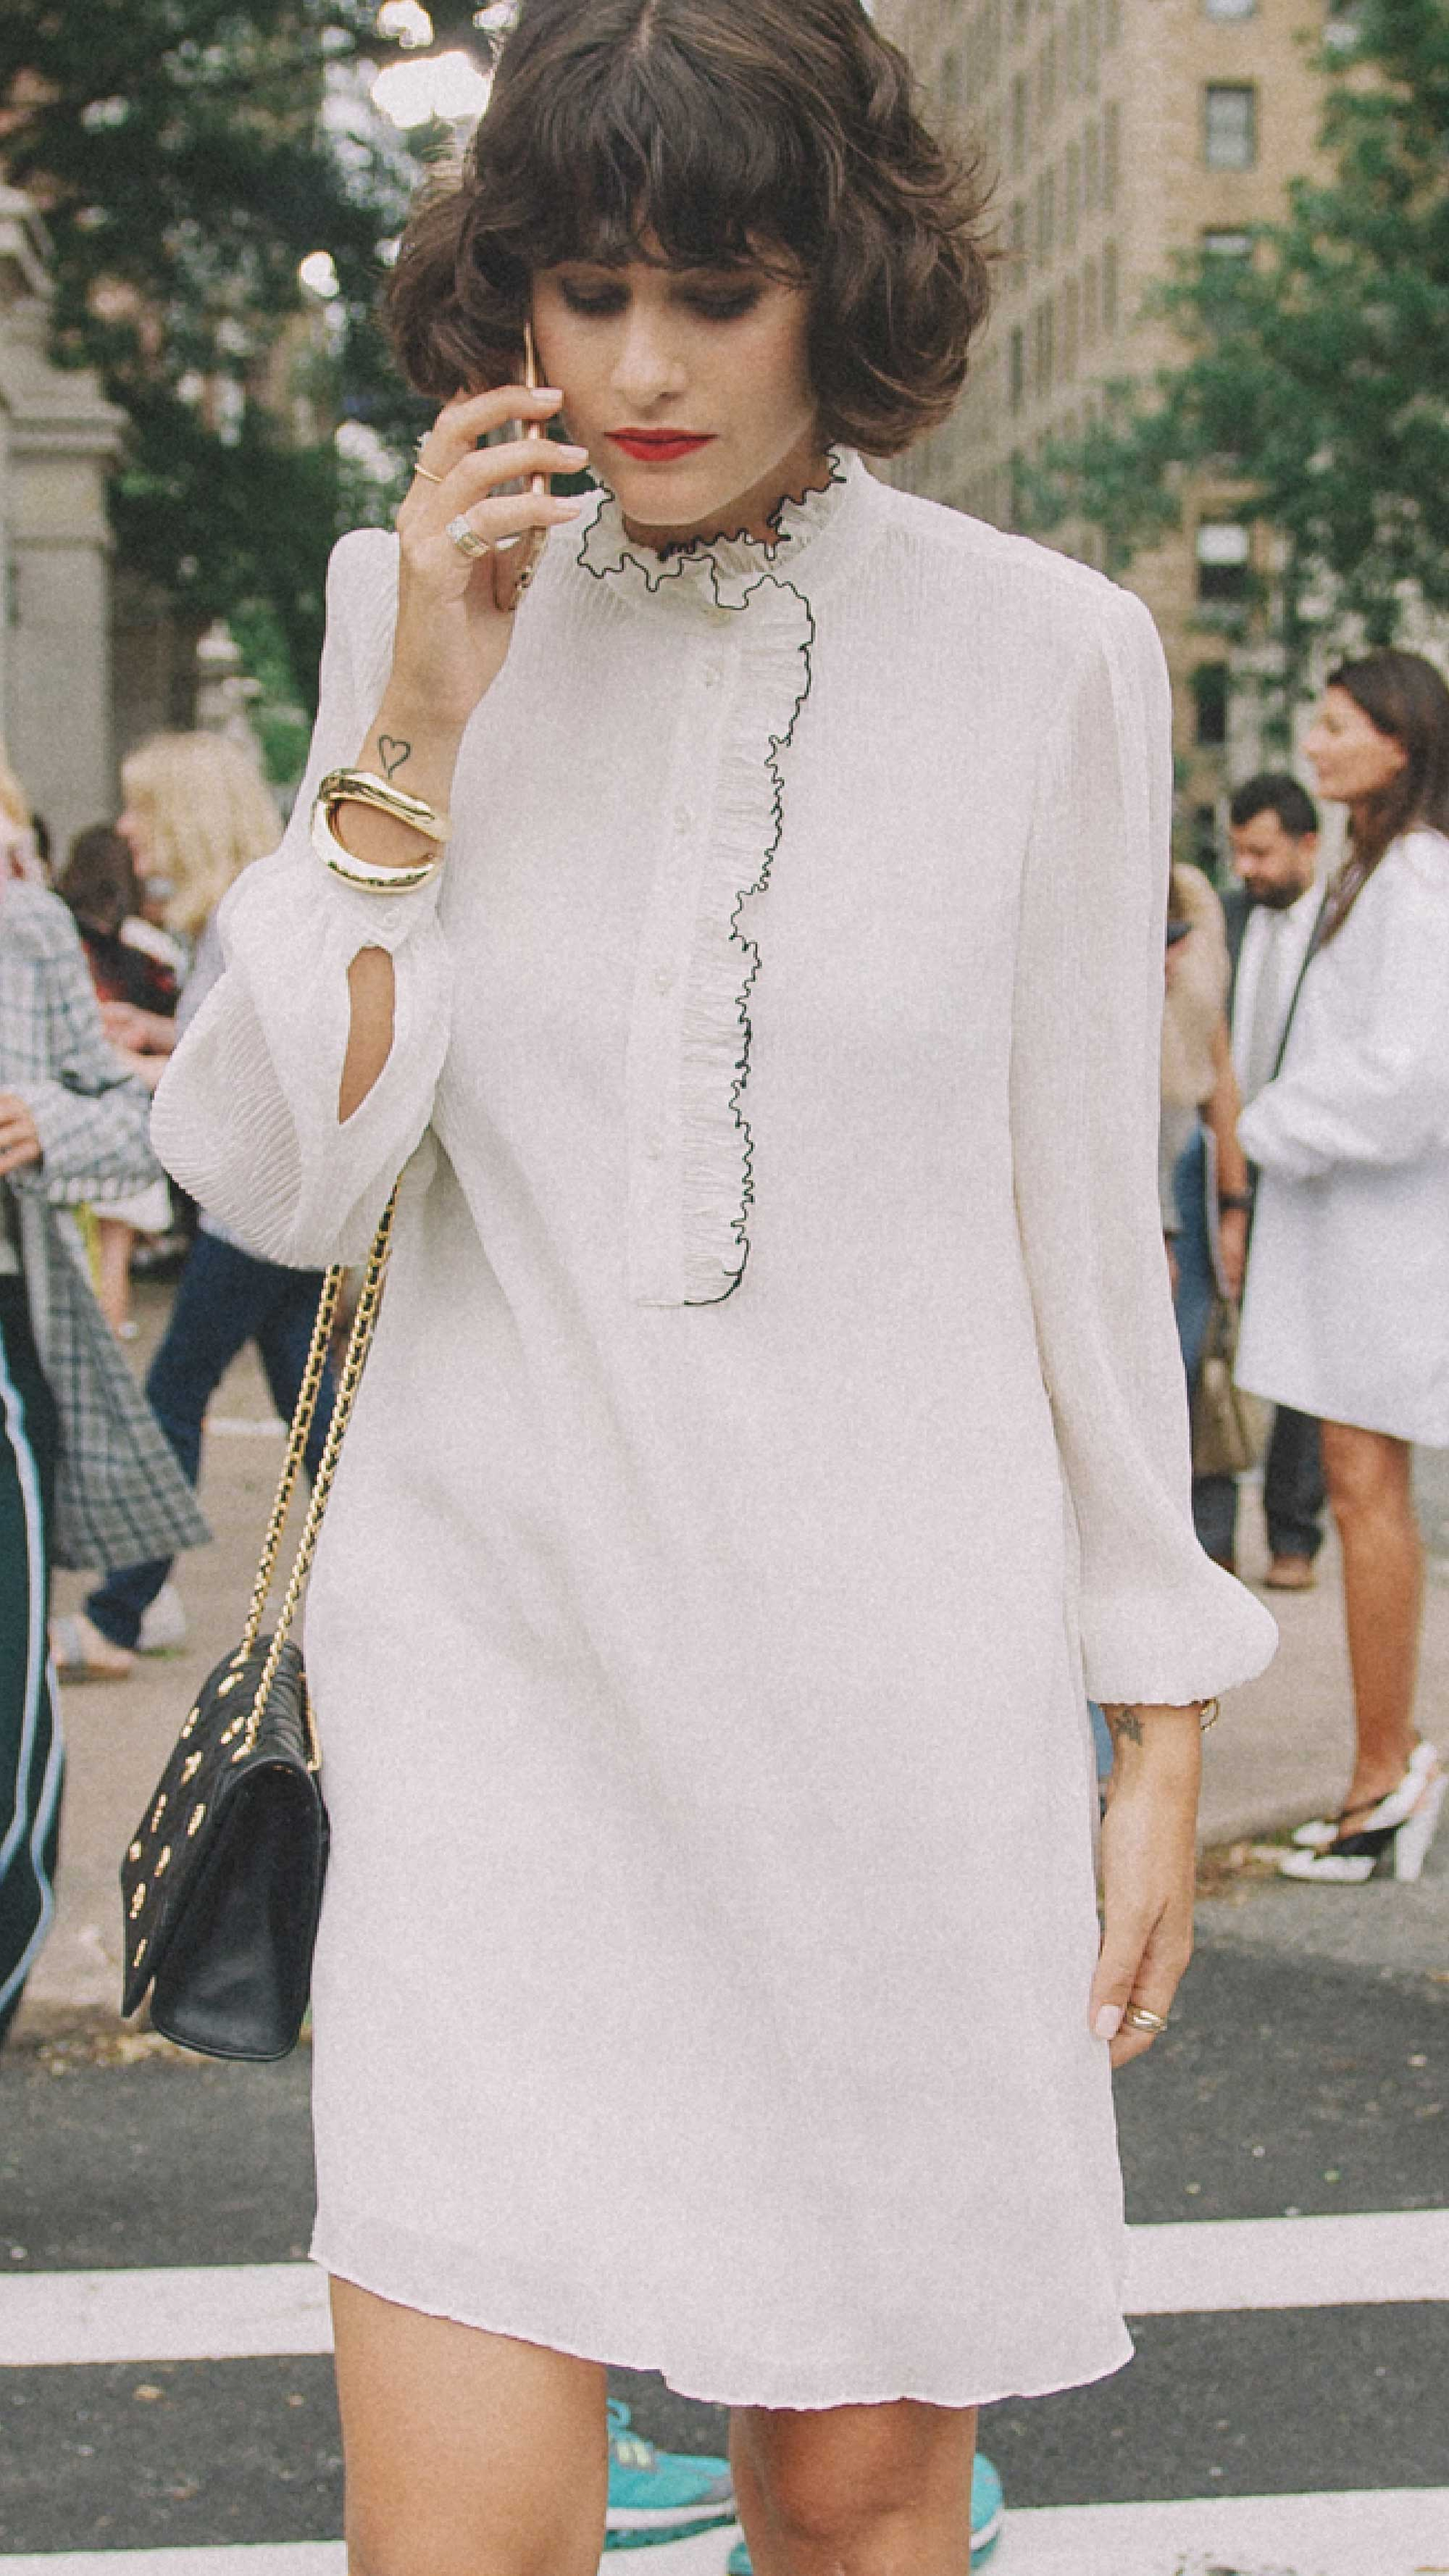 New-York-Fashion-Week-NYFW-SS18-street-style-day-two-SS18.jpg7.jpg